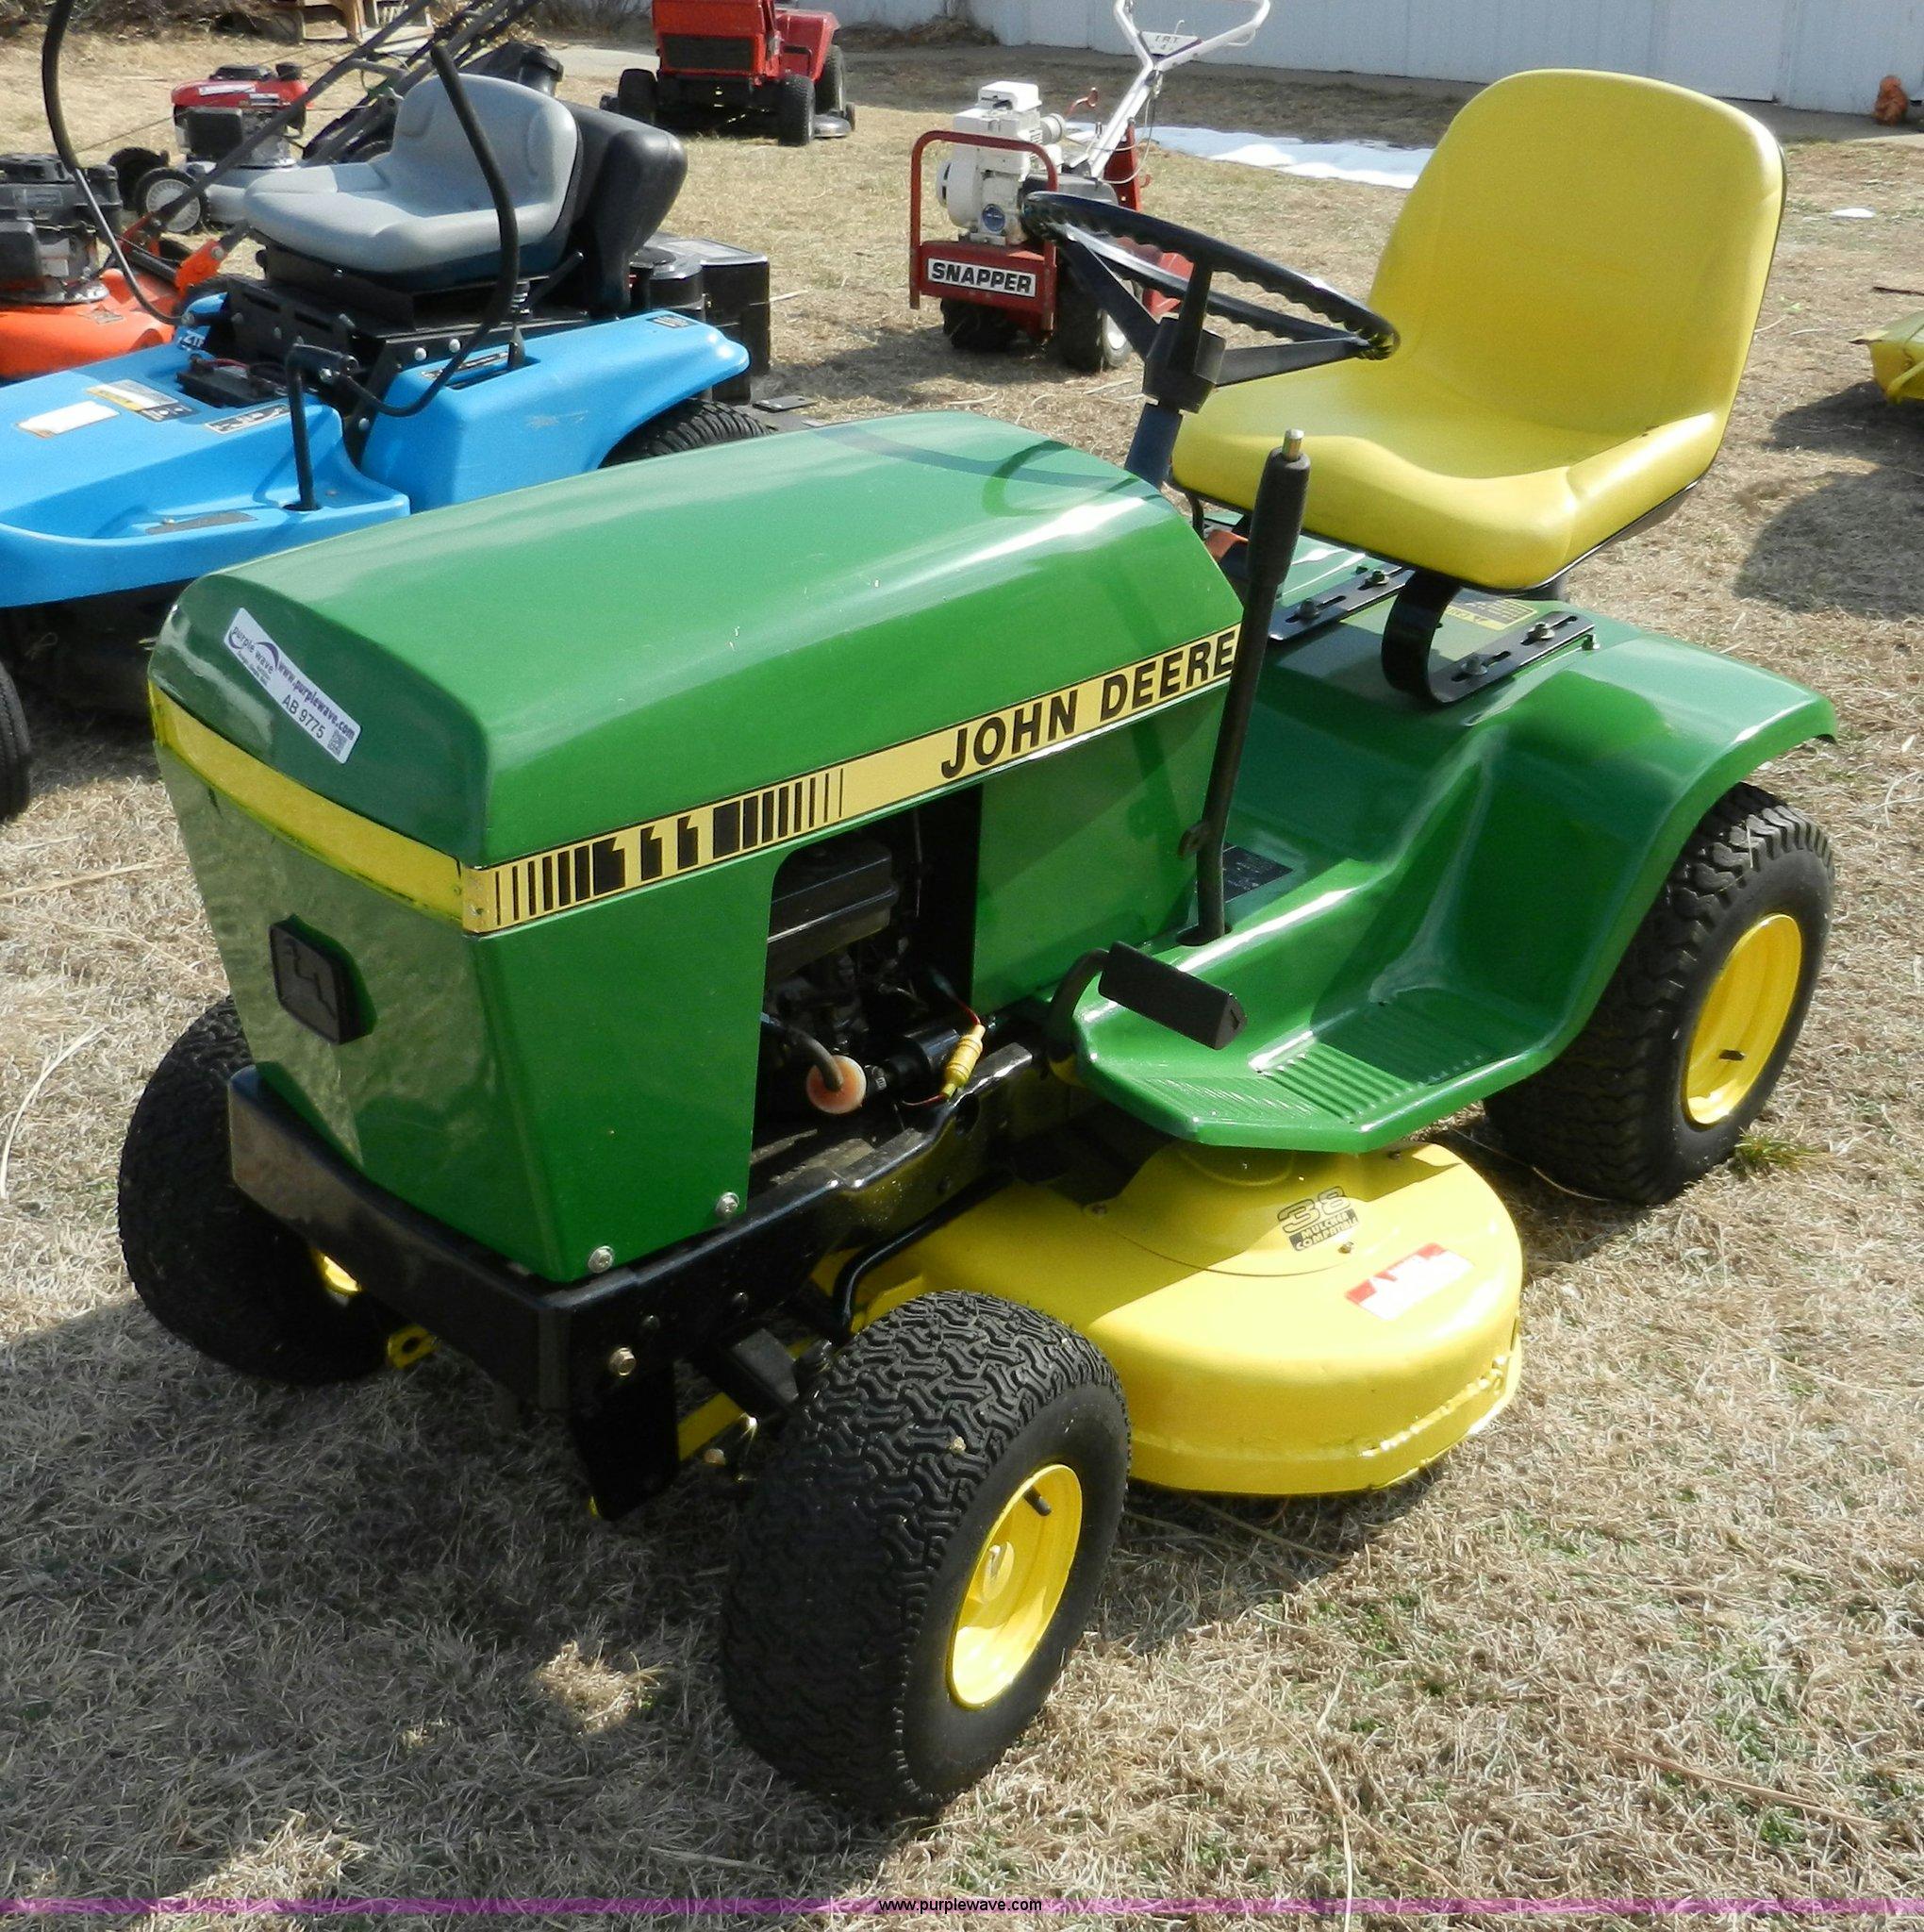 John Deere 111 Lawn Tractor Service Manual Riding Mower Wiring Diagram Item Ab9775 Sold March 6 Mi Rh Purplewave Com Information